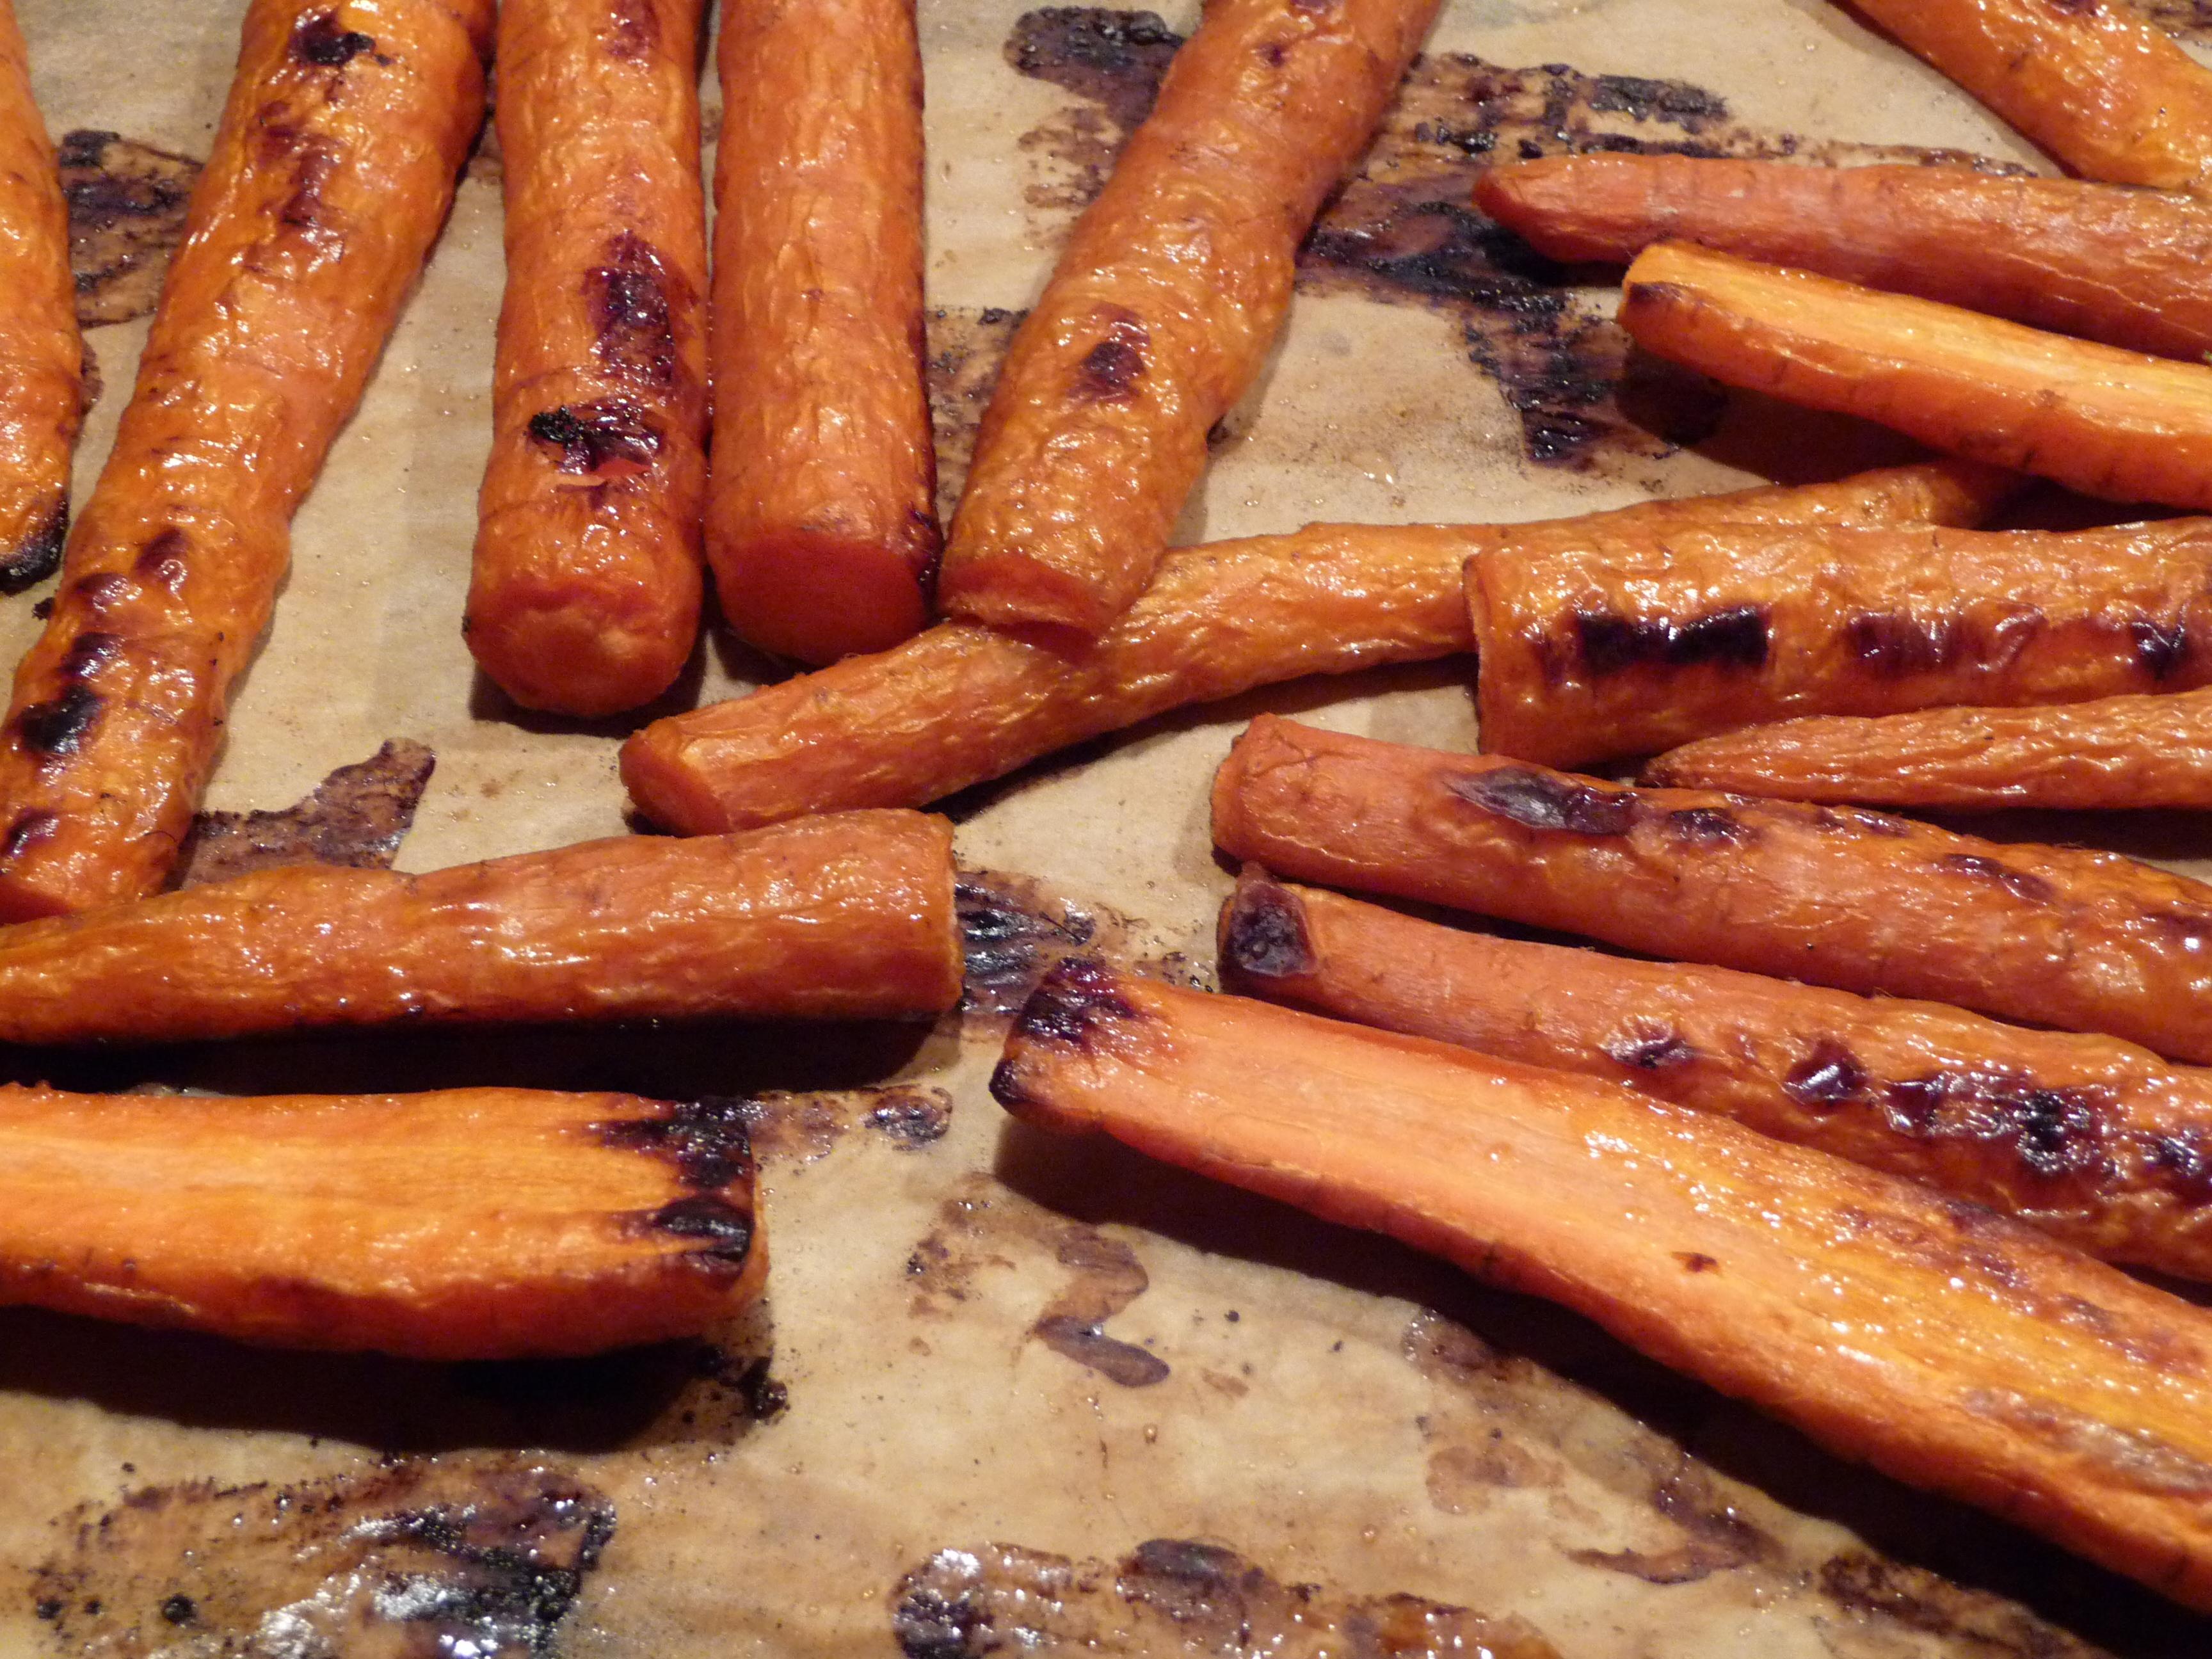 Roasted Carrots (c) jfhaugen